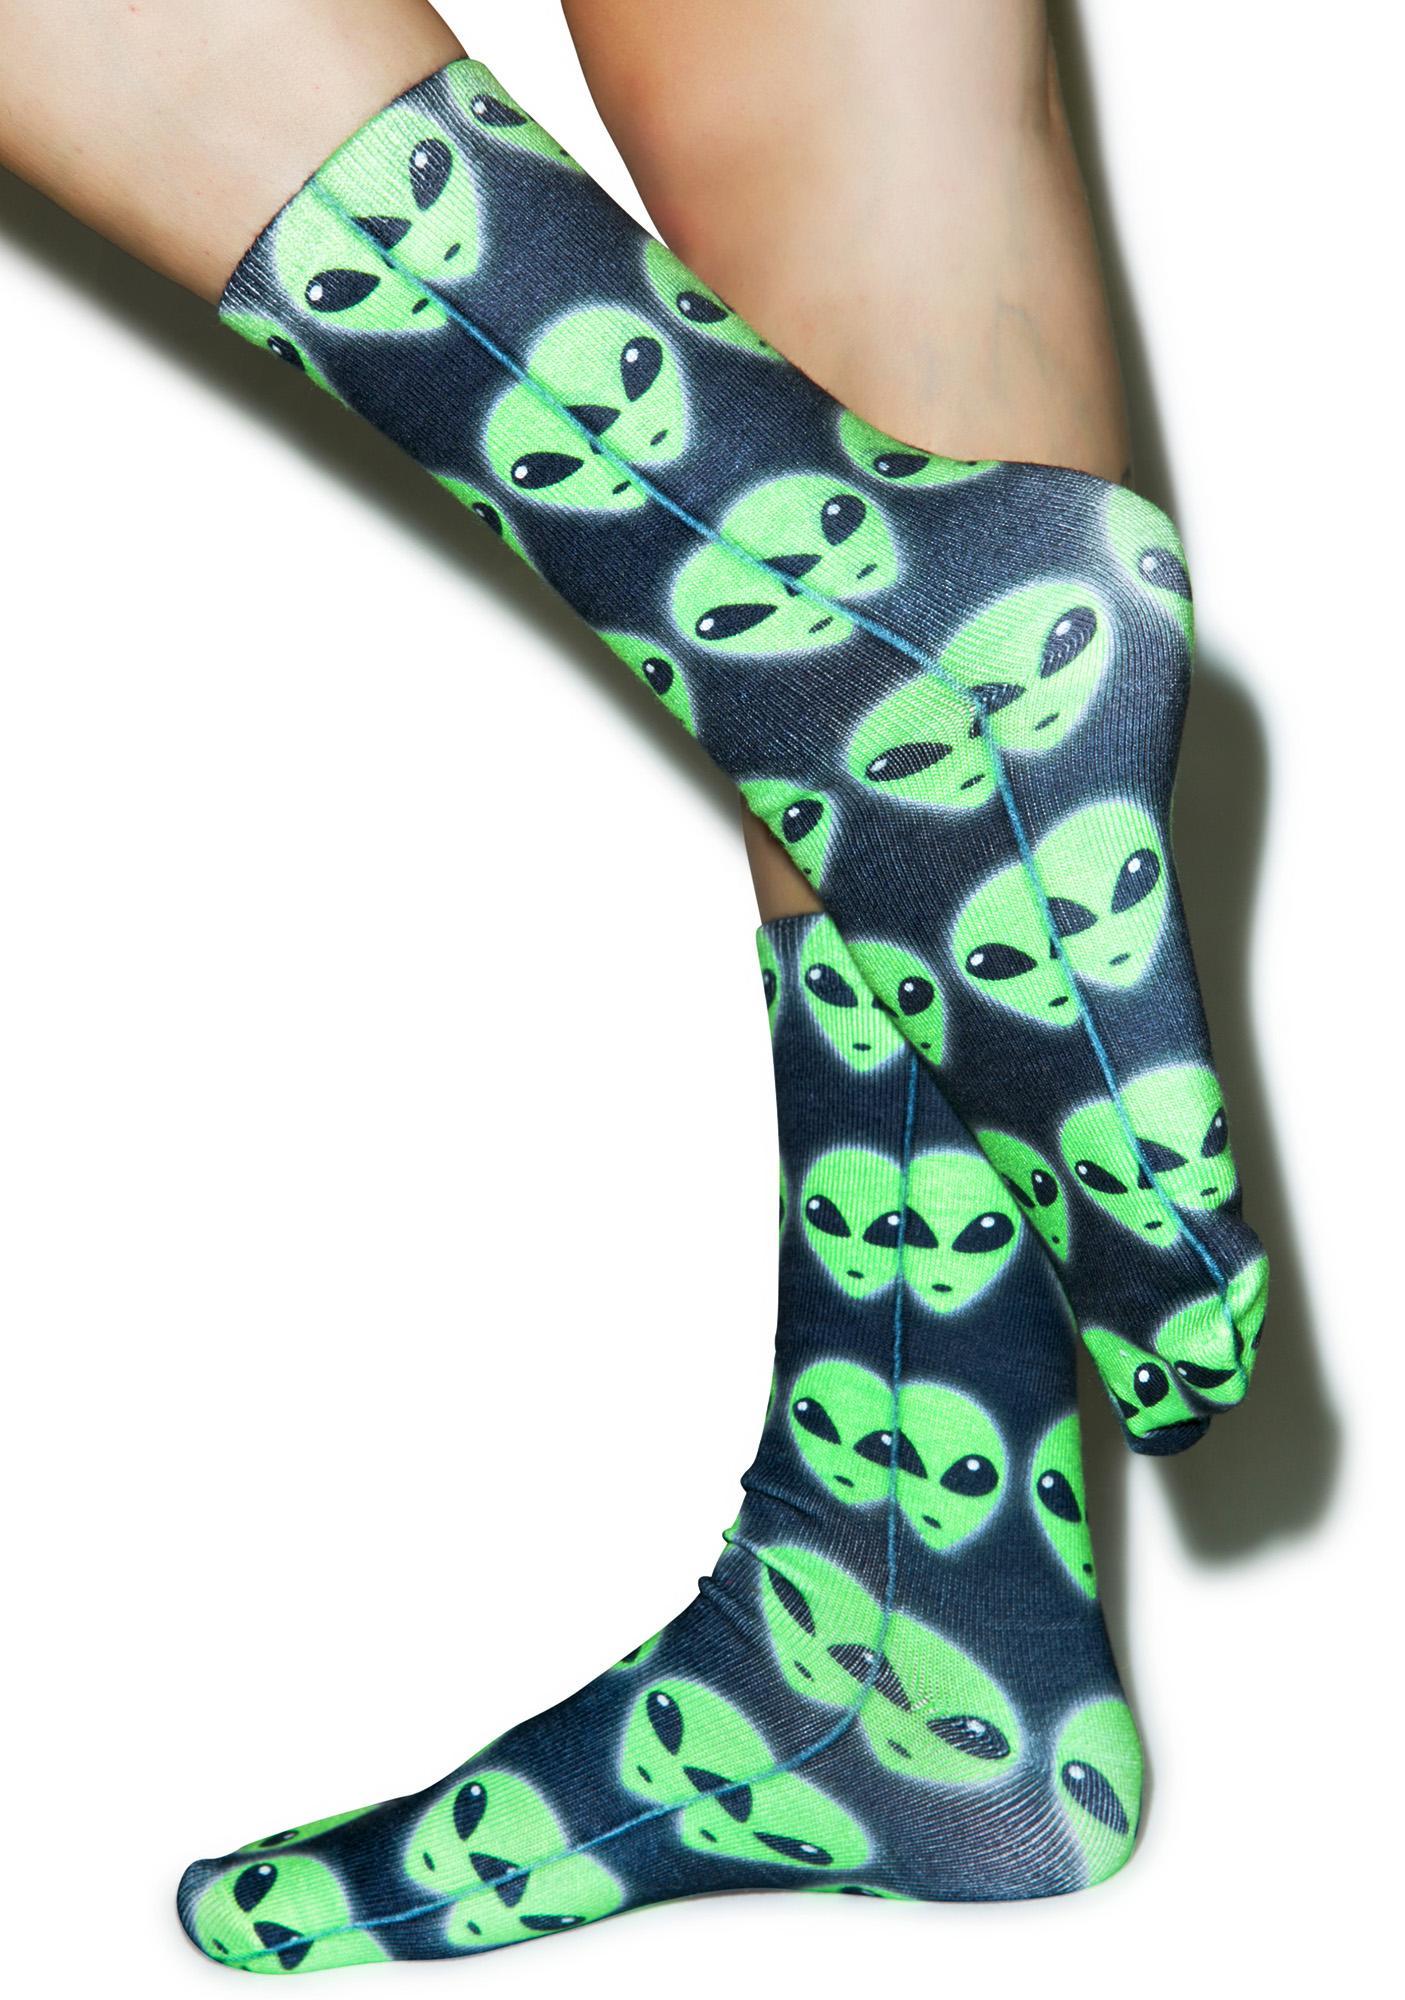 Foreign Crew Socks